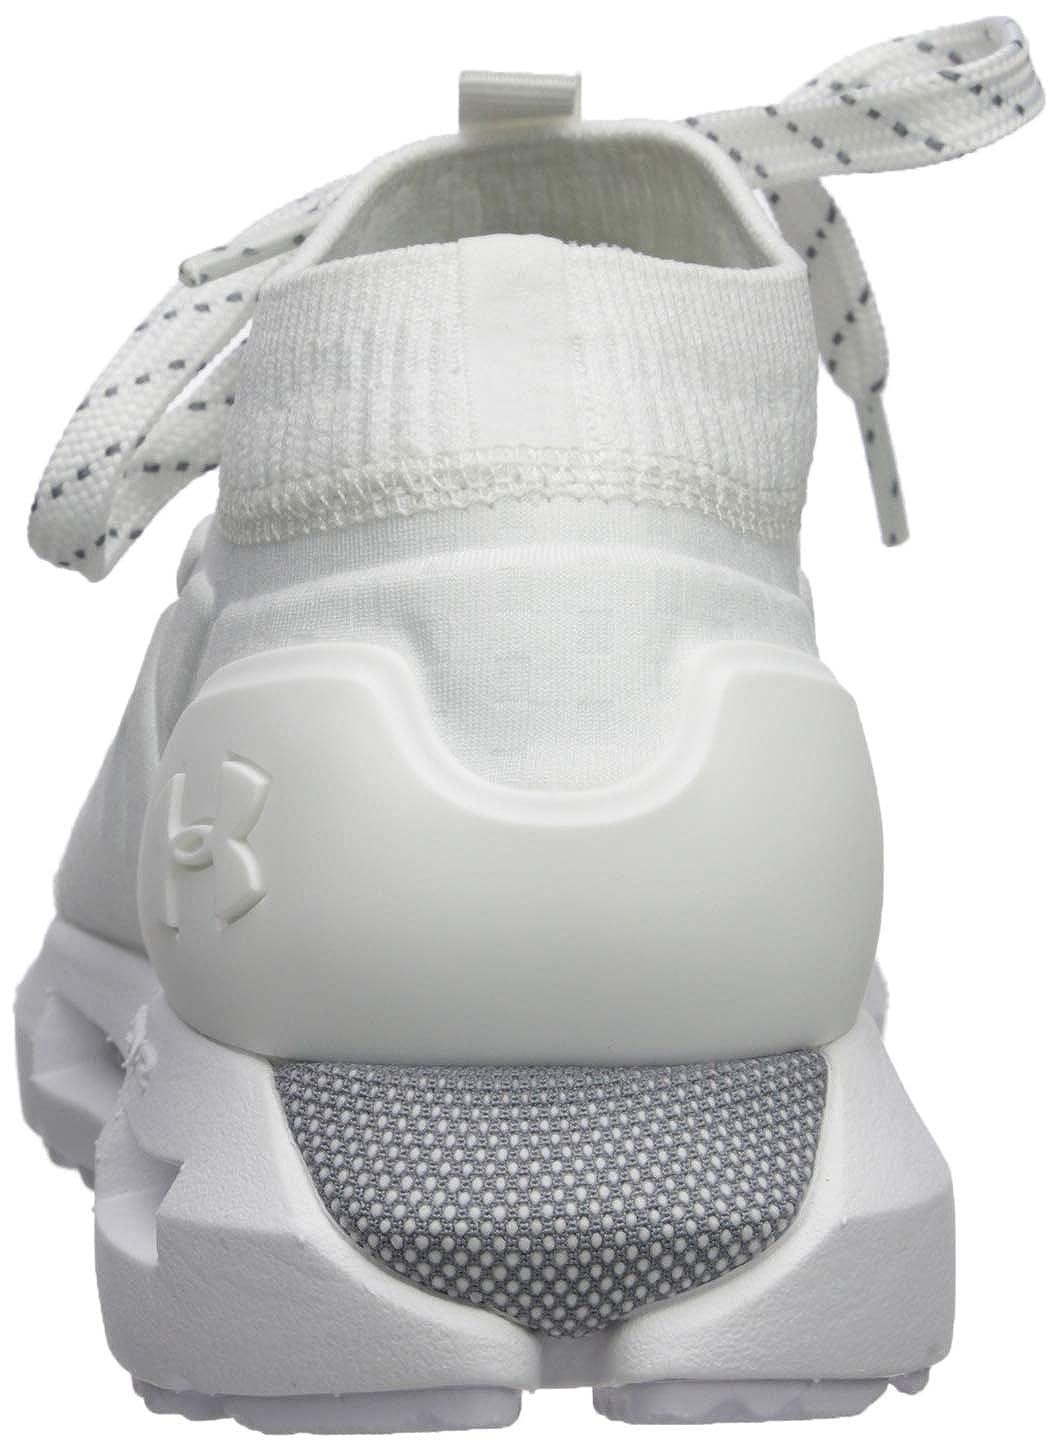 Under Armour Mens HOVR Phantom CT Running Shoe 3000004